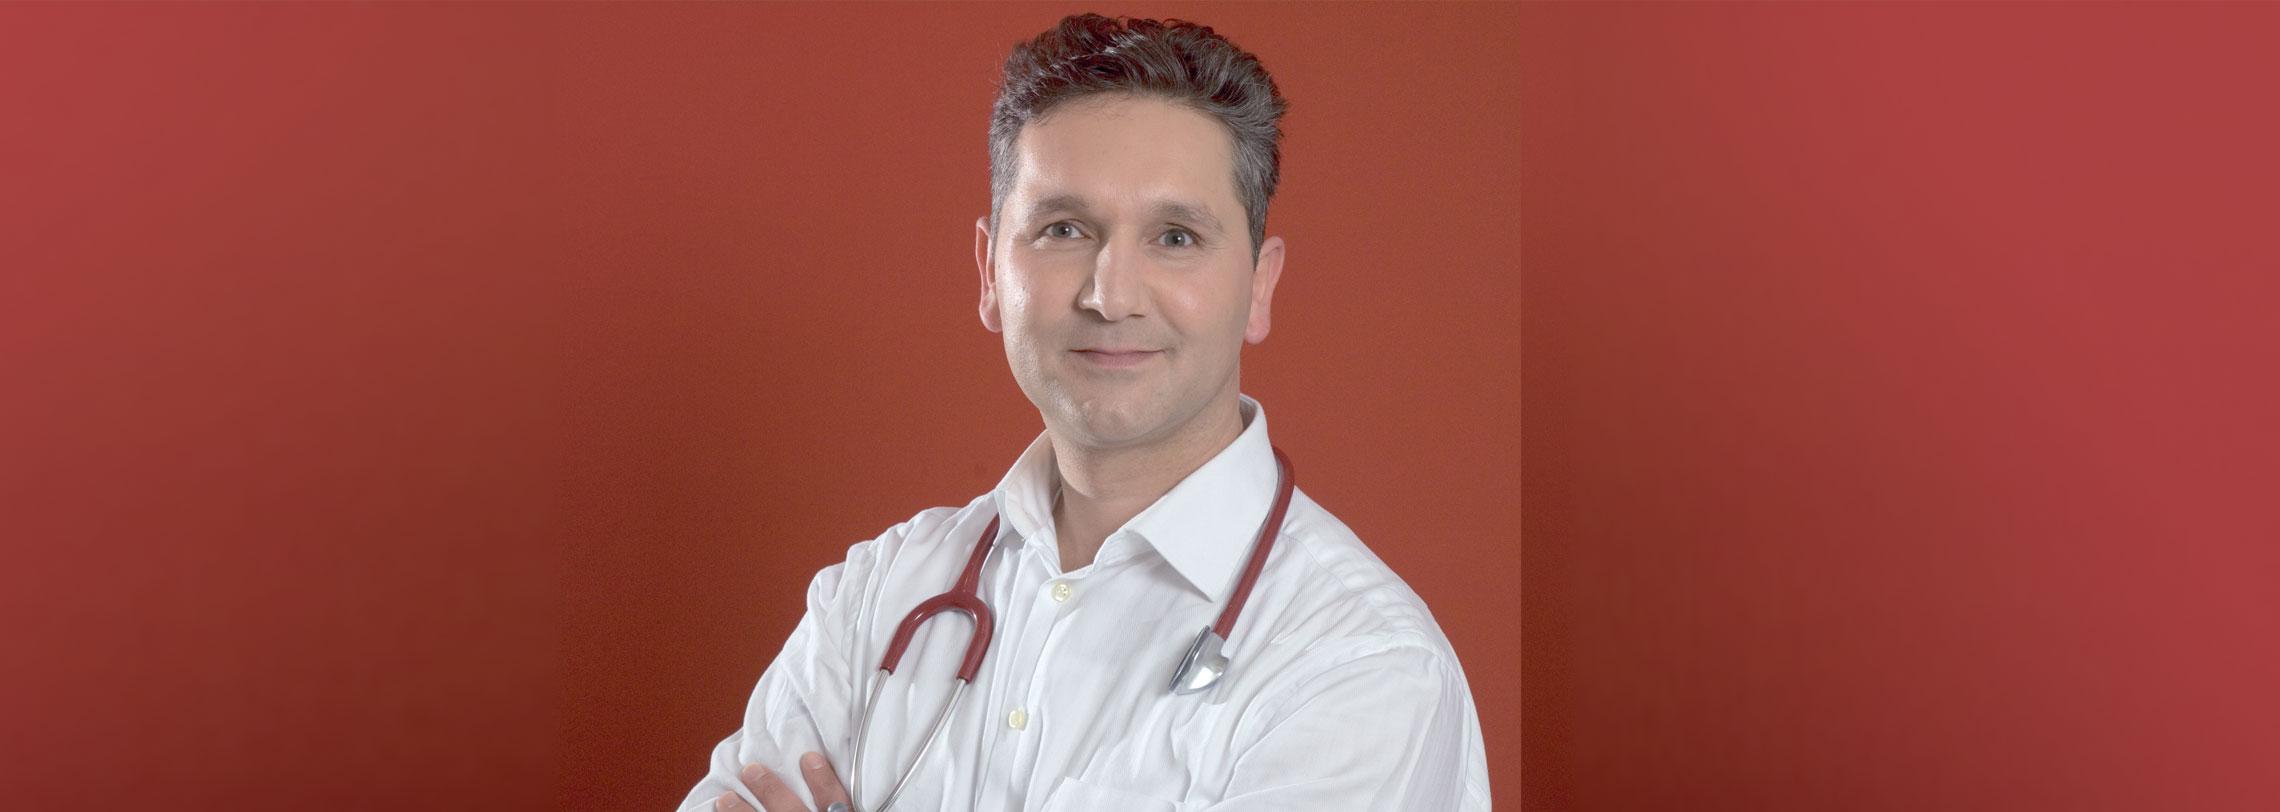 Dr. med. Engin Osmanoglou Kardiologie Berlin Zehlendorf Schlachtensee